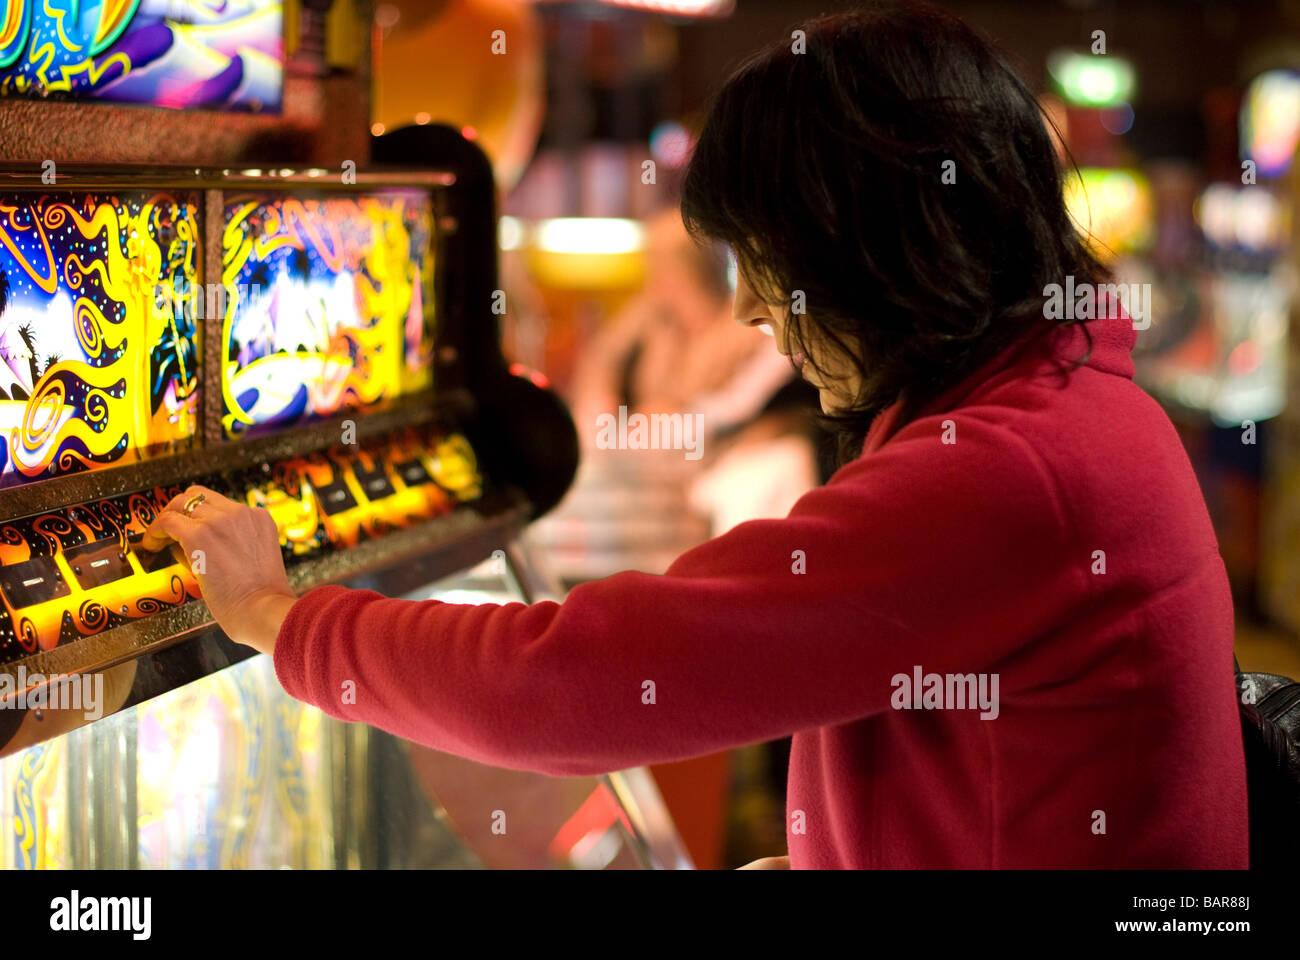 Amusement Arcade - Stock Image